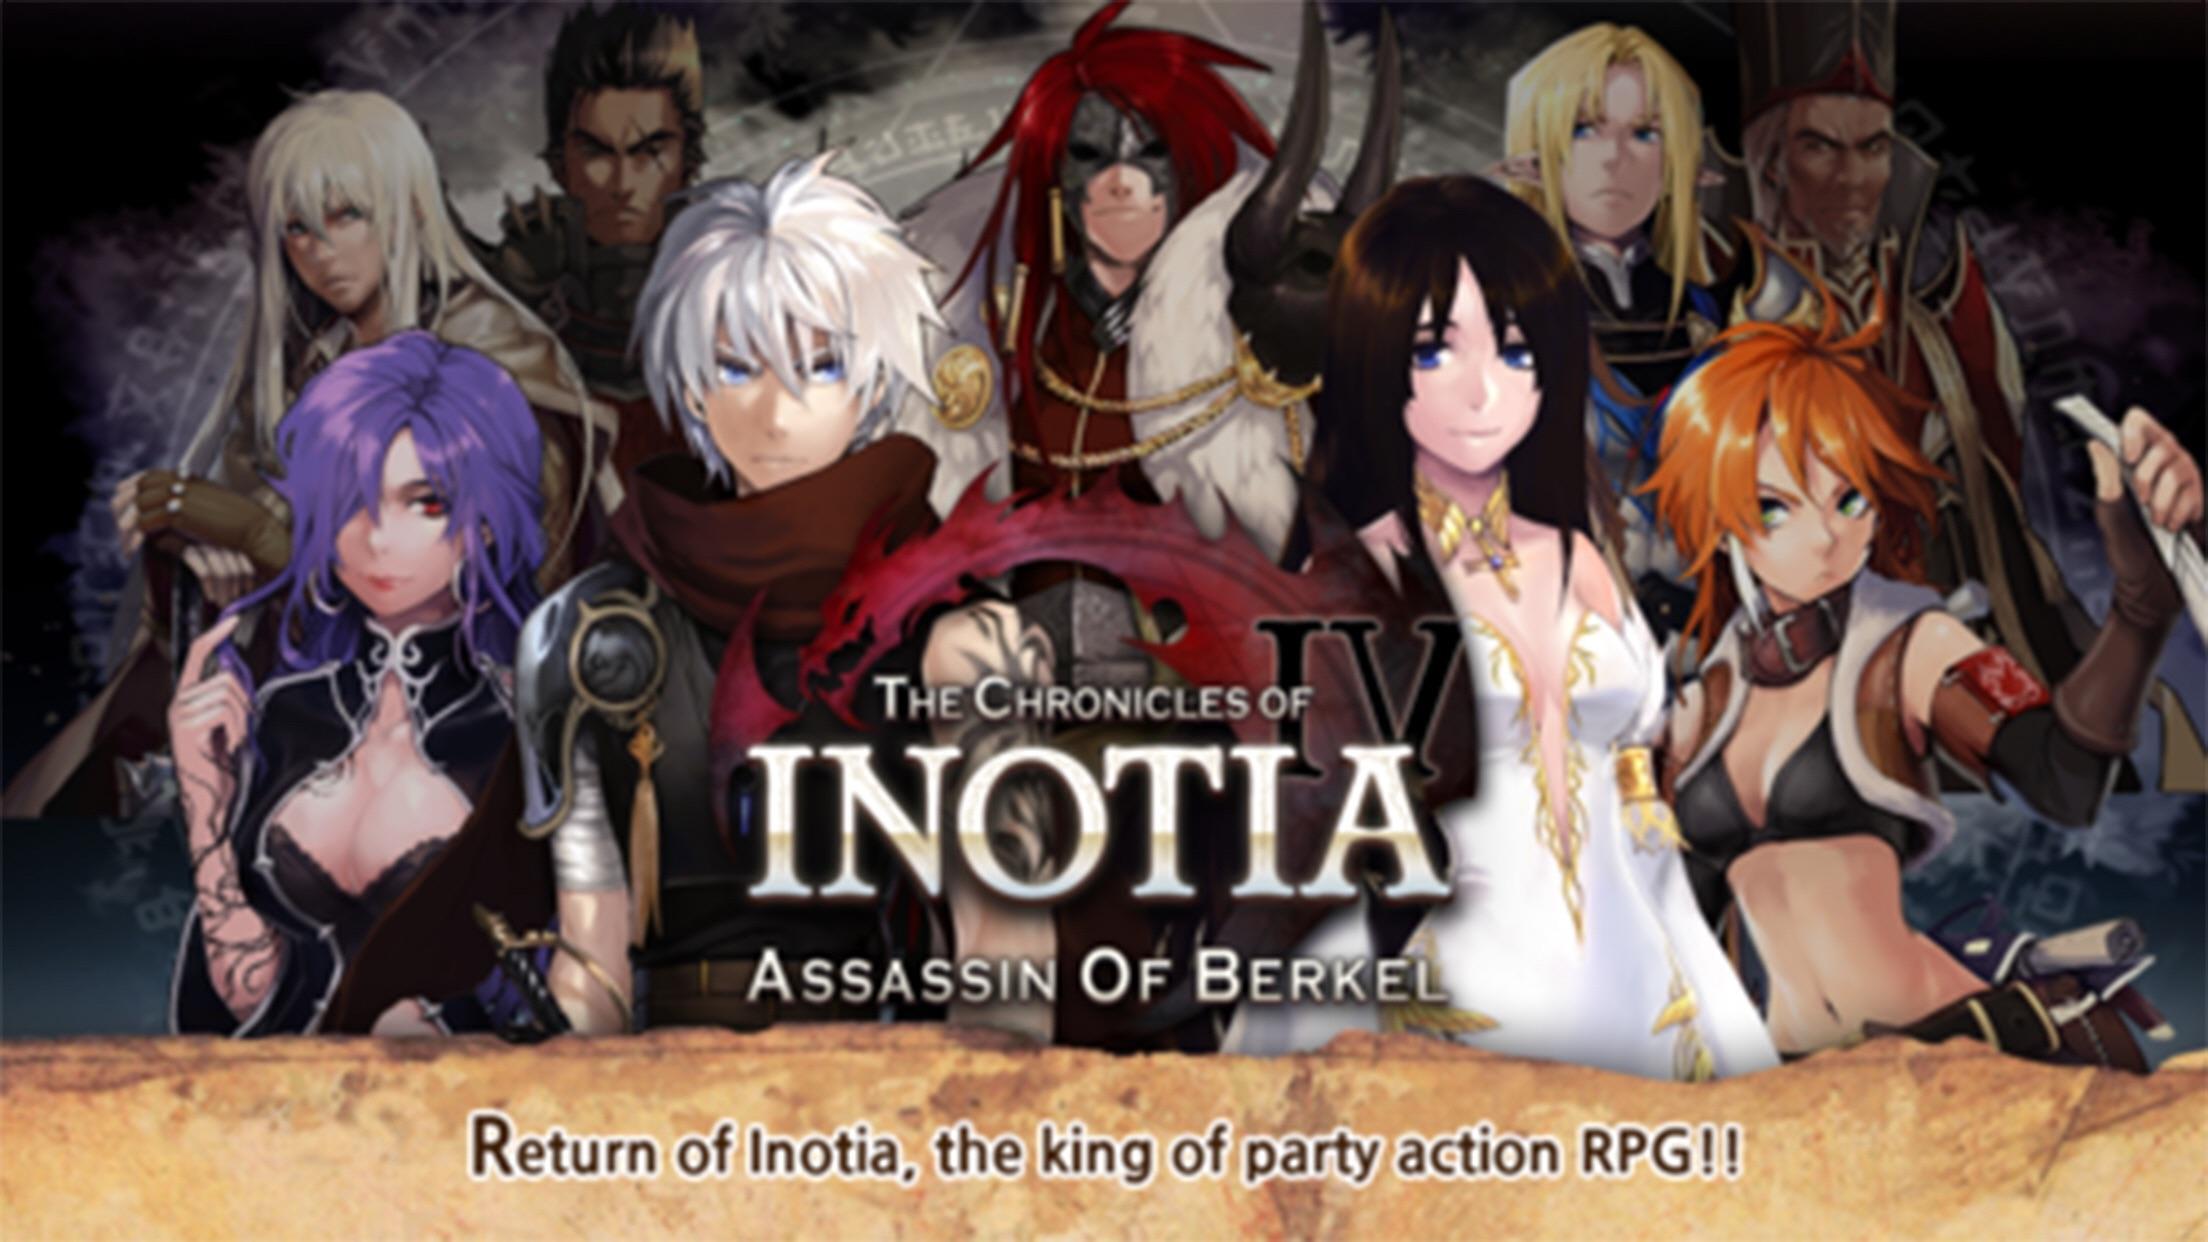 Inotia 4 PLUS Screenshot